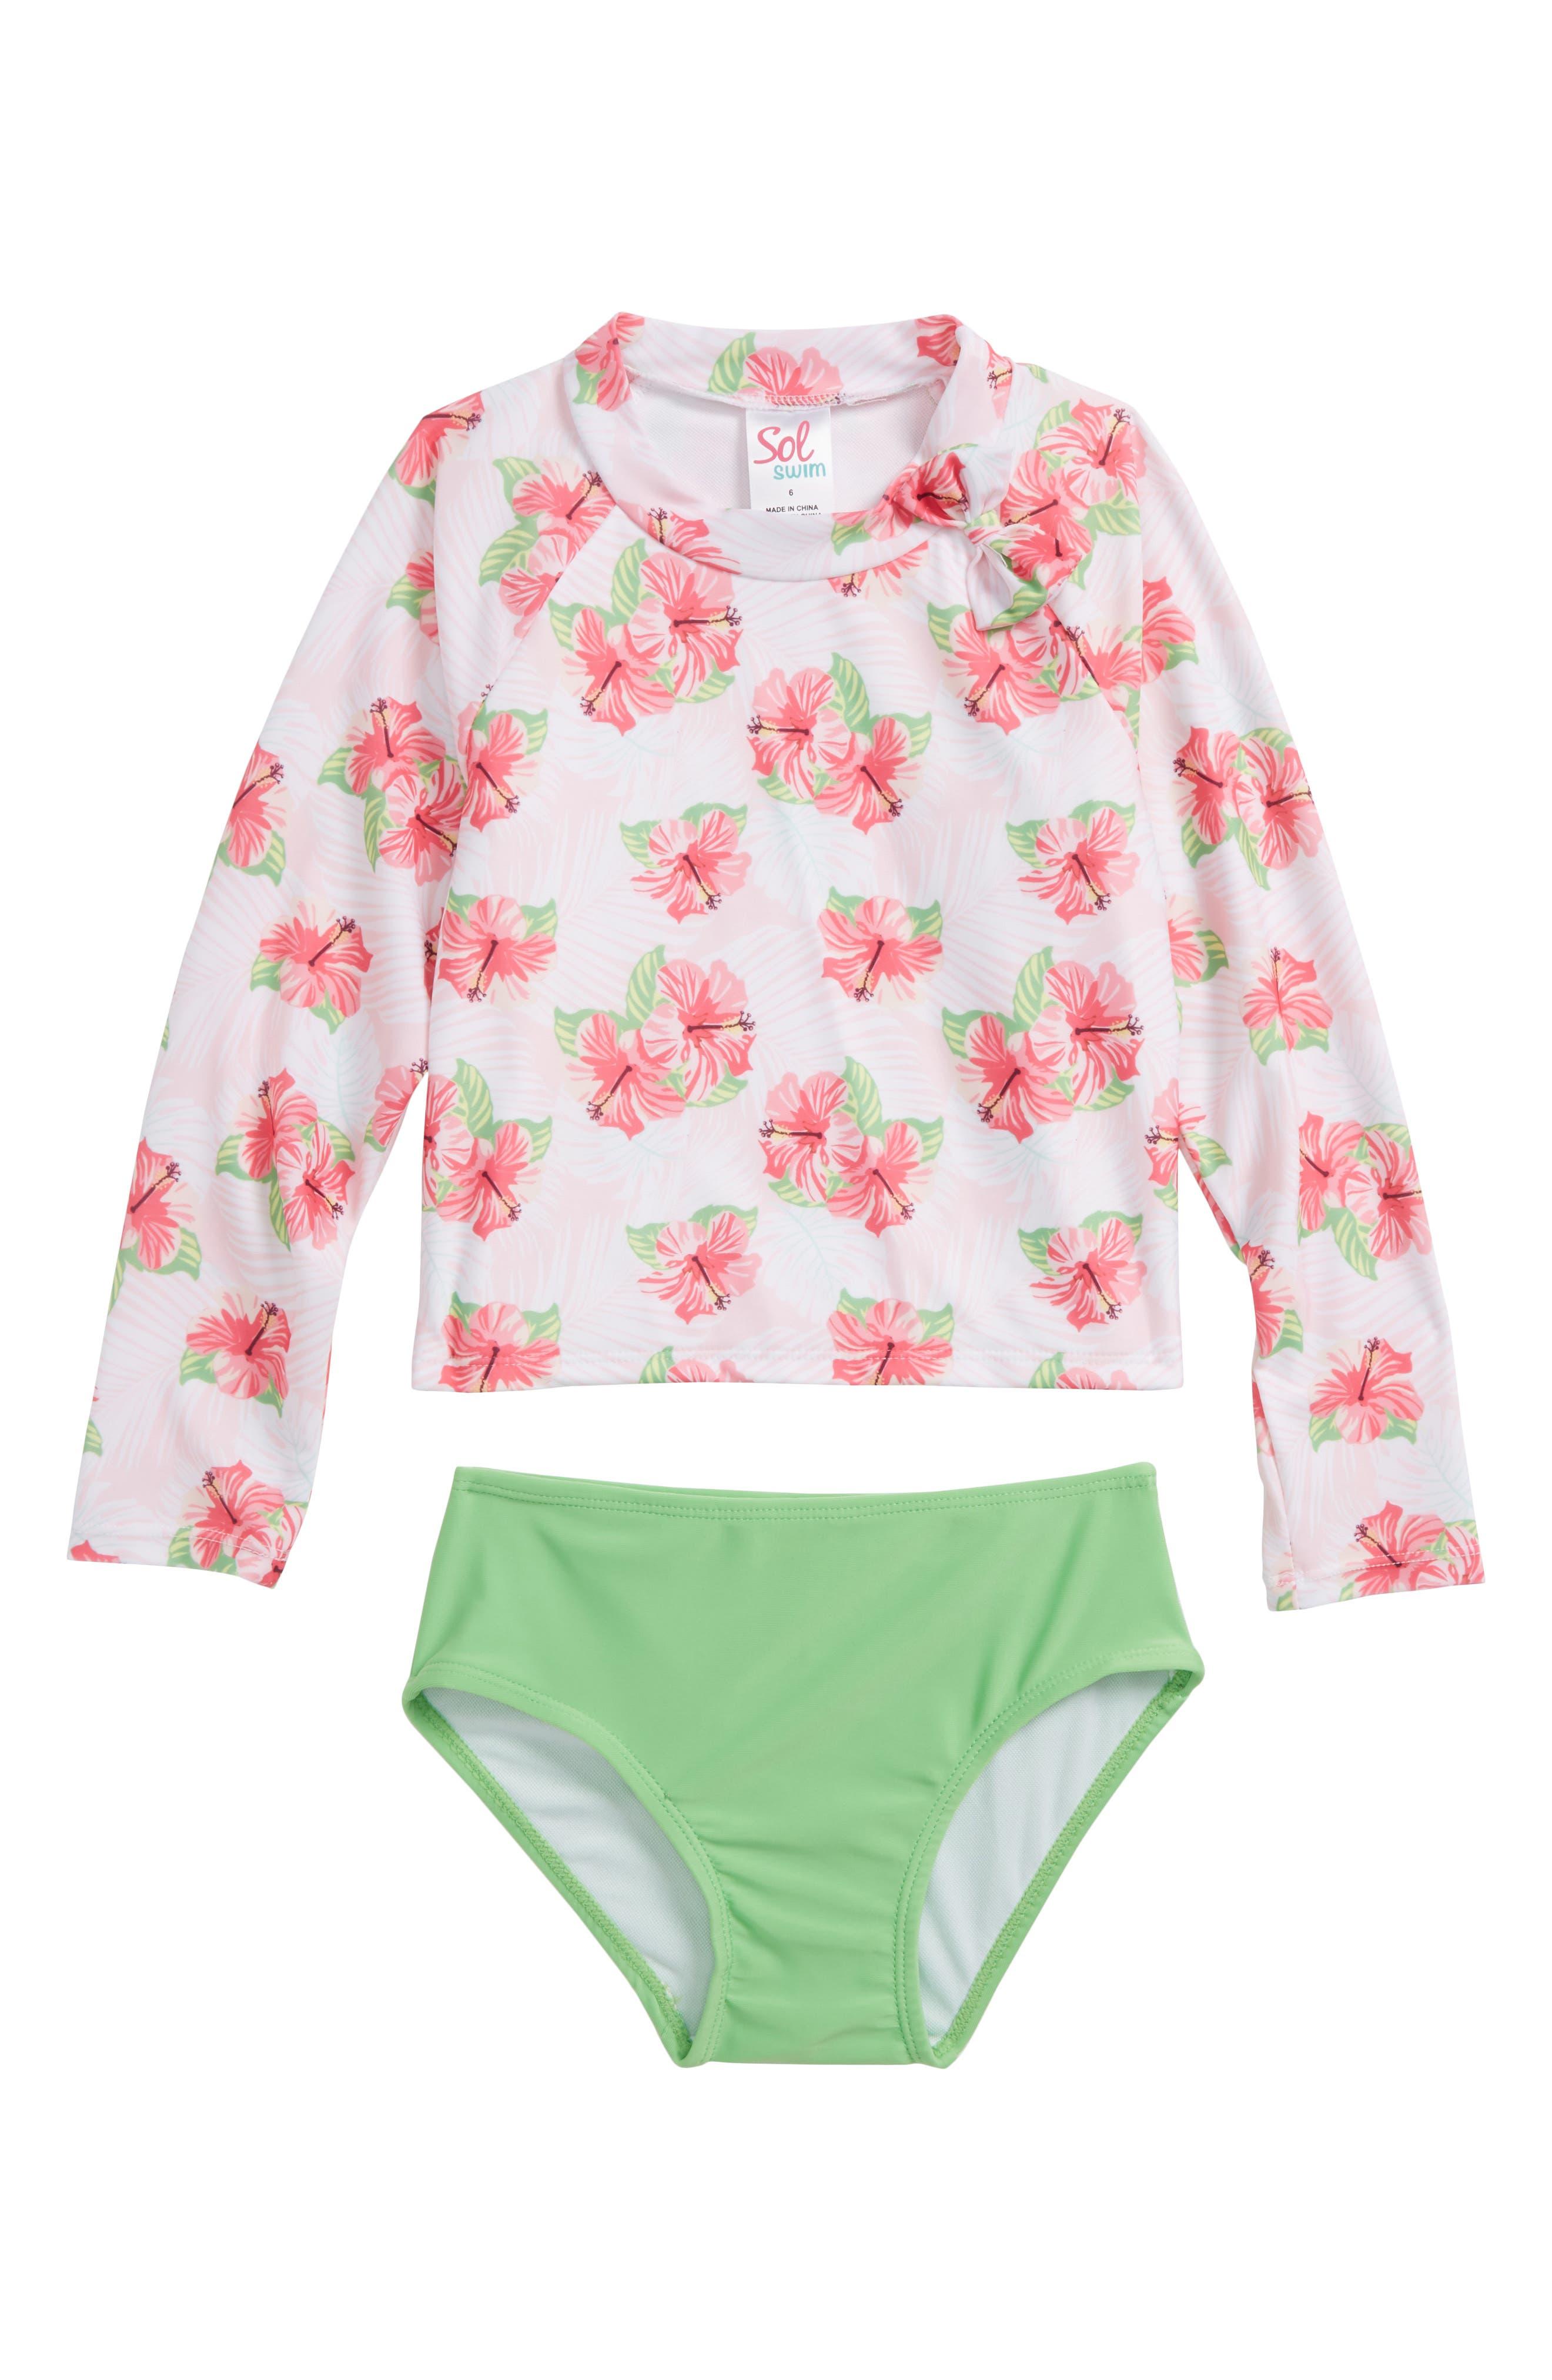 Hibiscus Splash Two-Piece Rashguard Swimsuit,                             Main thumbnail 1, color,                             659